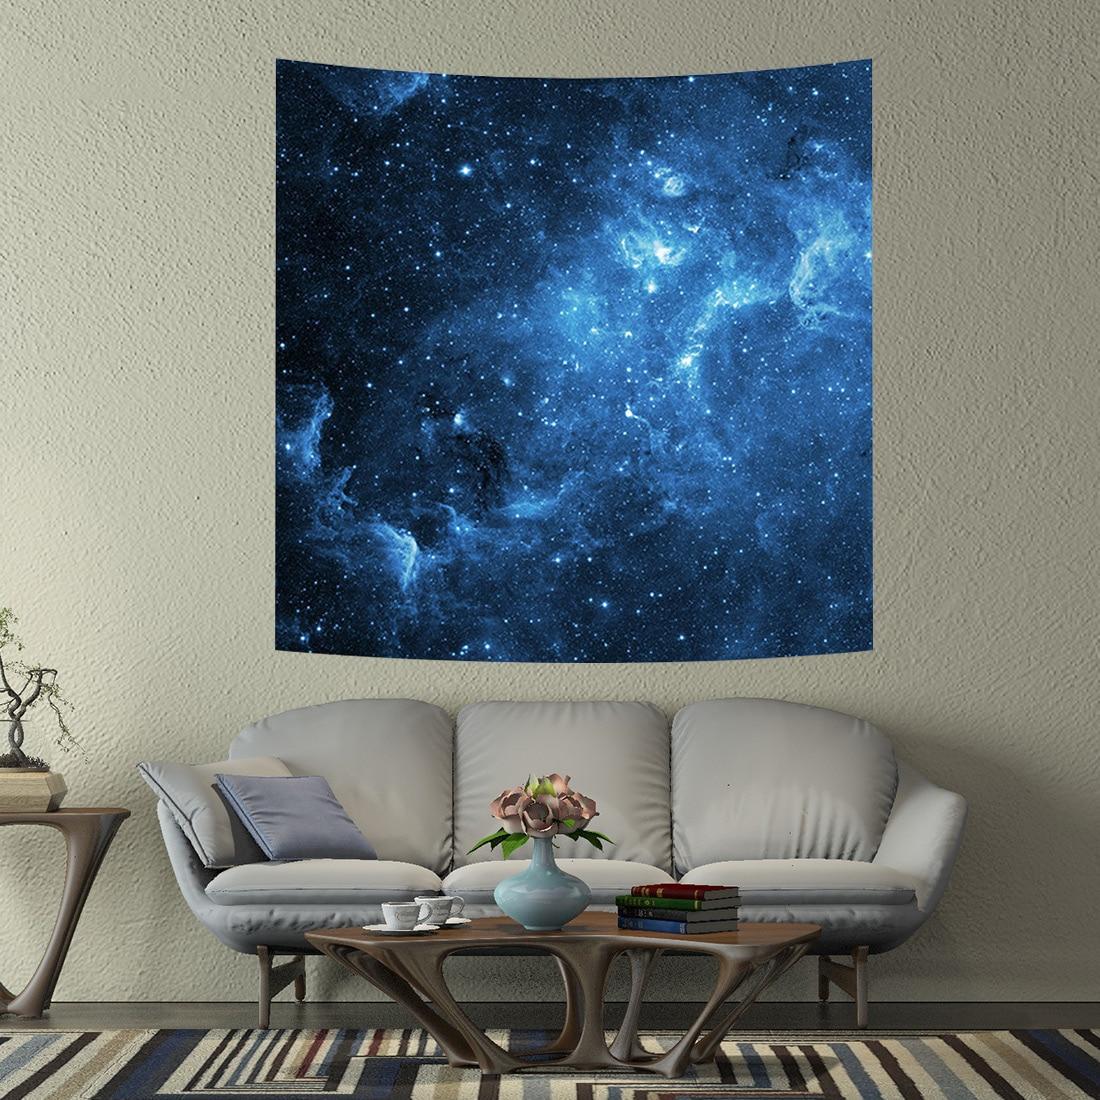 Aliexpress.com : Buy NEW Tapestry Hippie Galaxy Home Decor